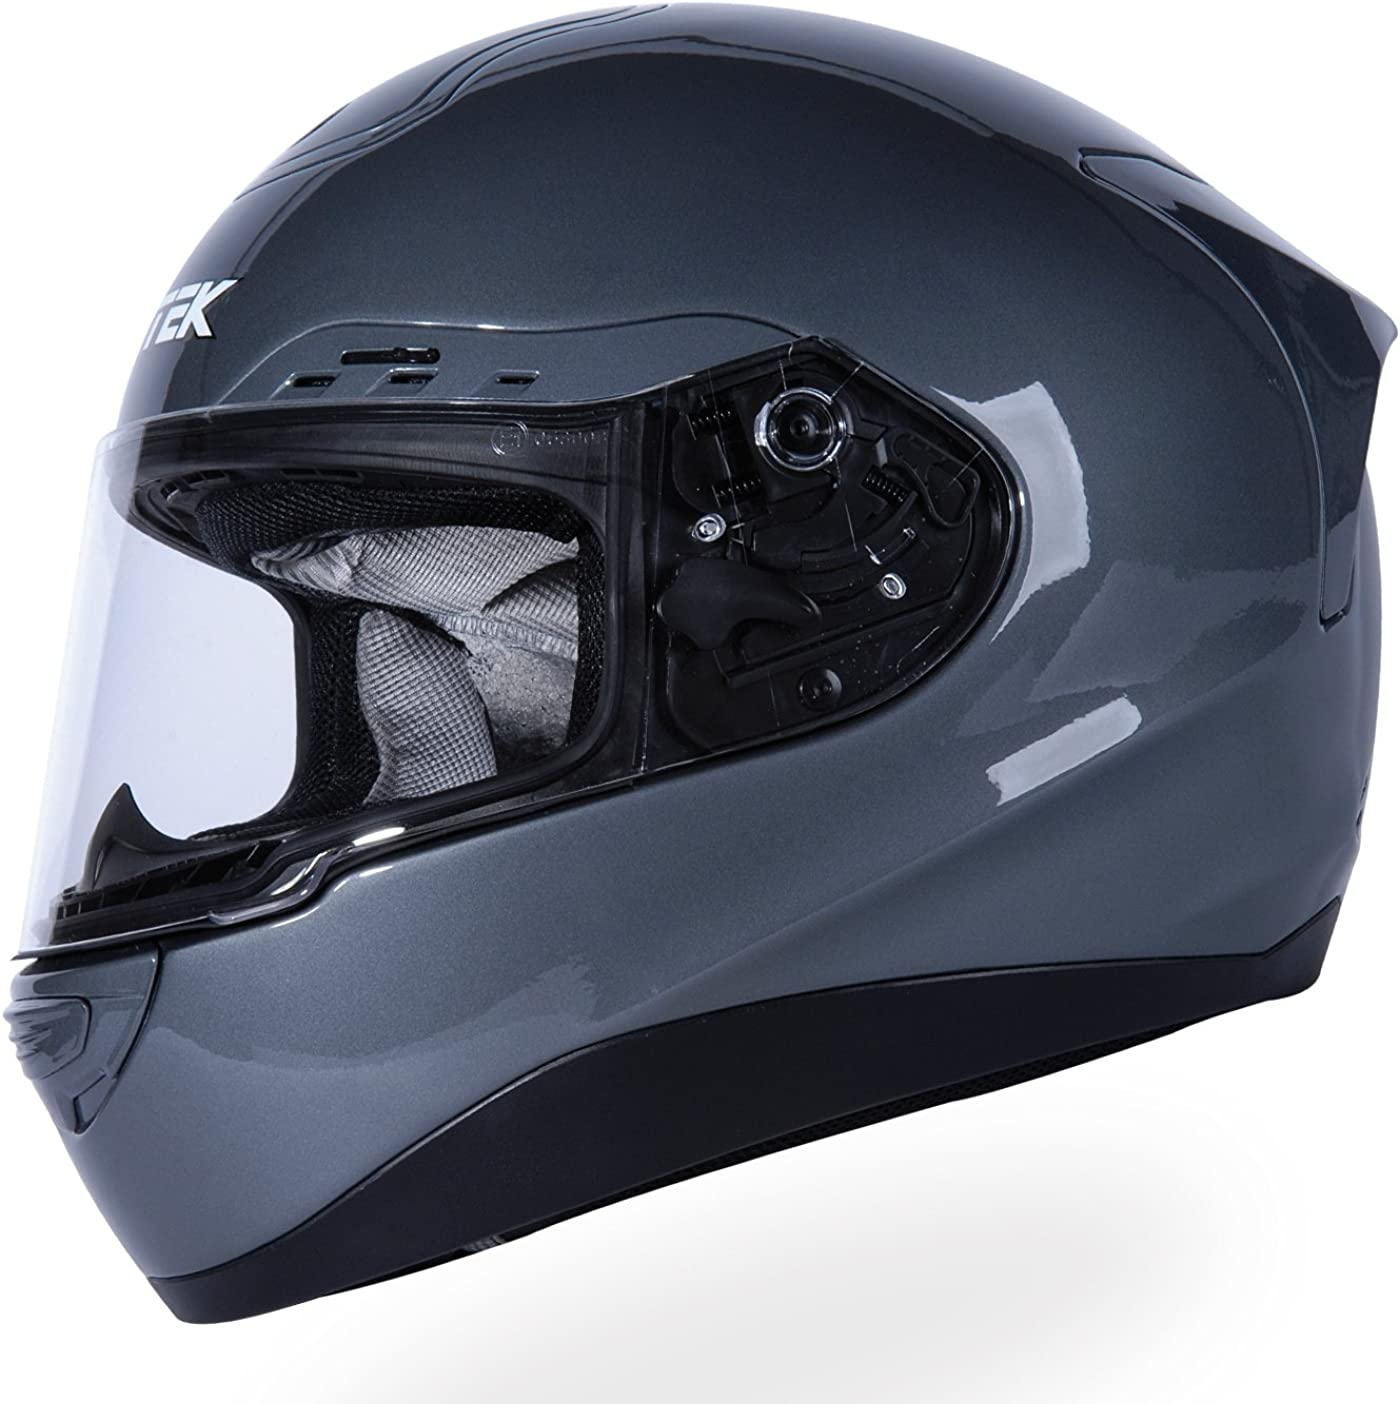 Austin Mall Nitek P1 Full-Faced Motorcycle Graphic Helmet Dimension Max 84% OFF Street